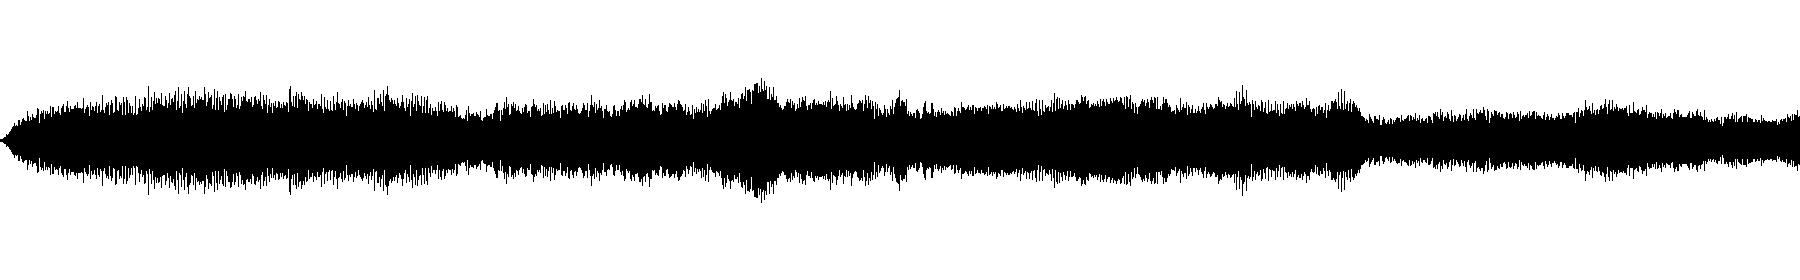 vedh melodyloop 034 bm7 cmaj7 d em g 122bpm